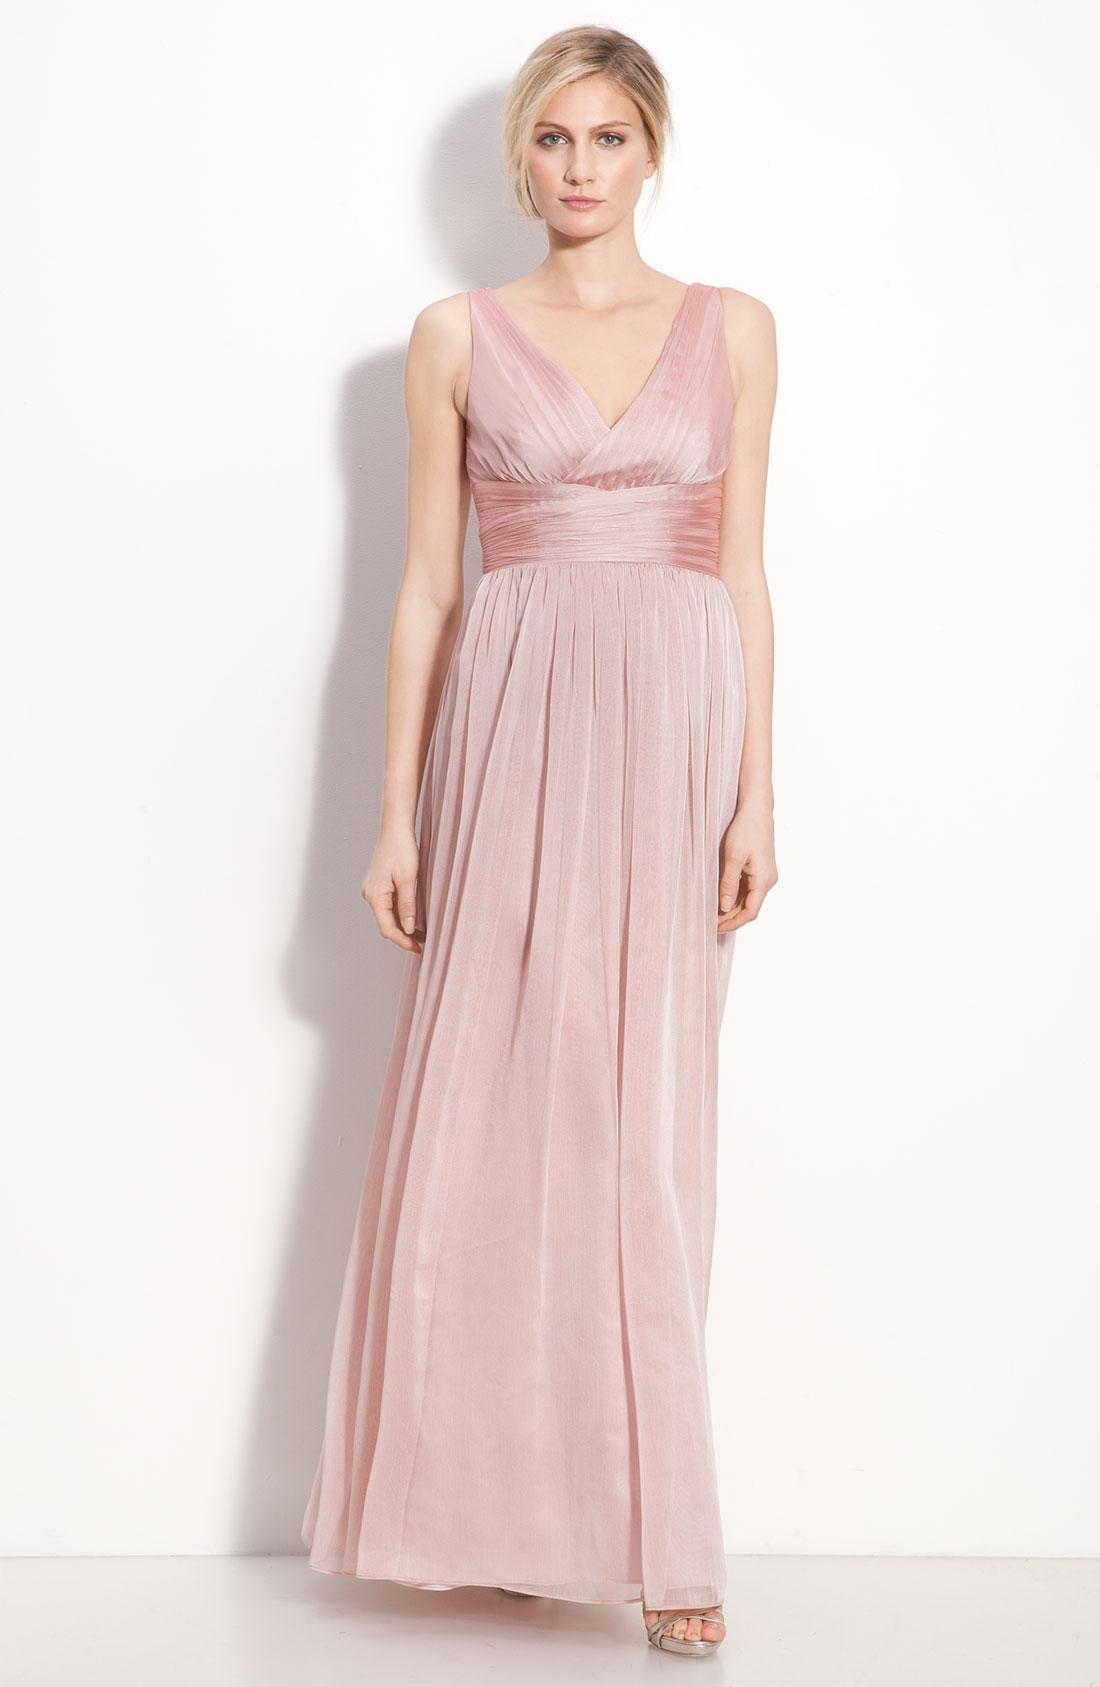 Monique Lhuillier Bridesmaid Dresses